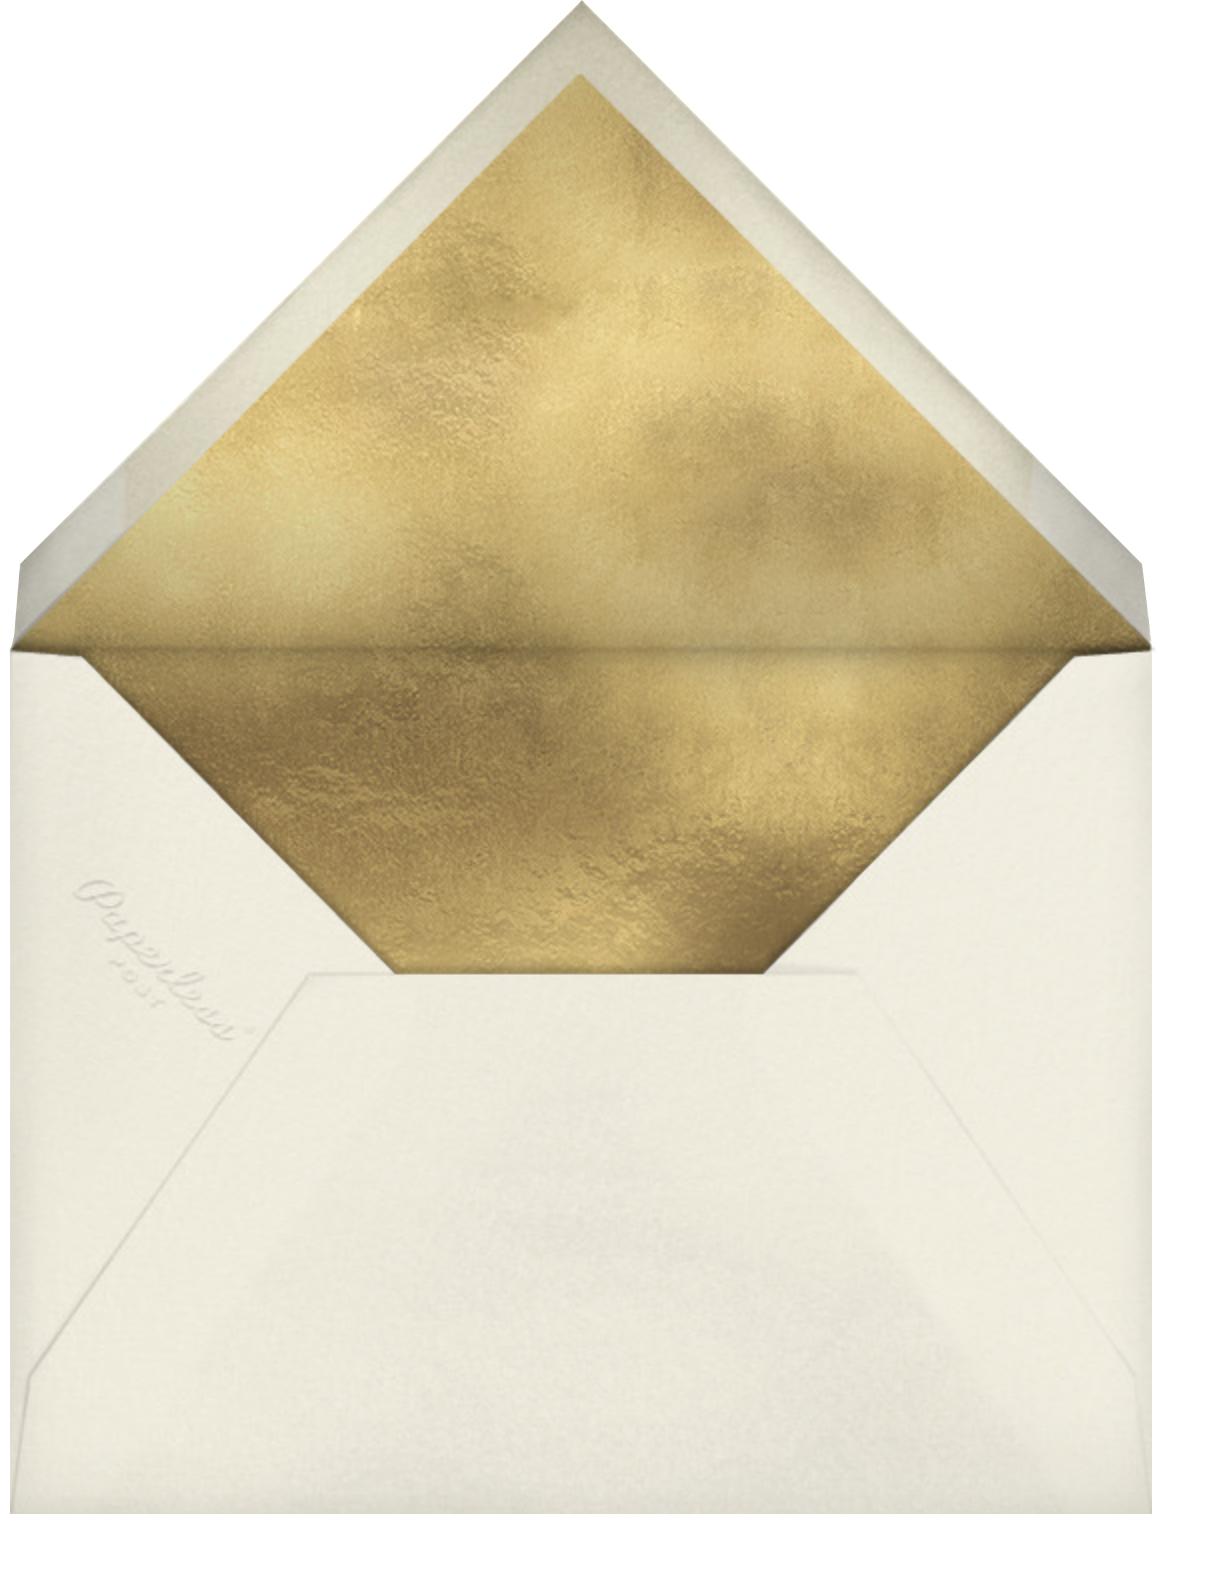 Perfect Spots - Cream - kate spade new york - Adult birthday - envelope back